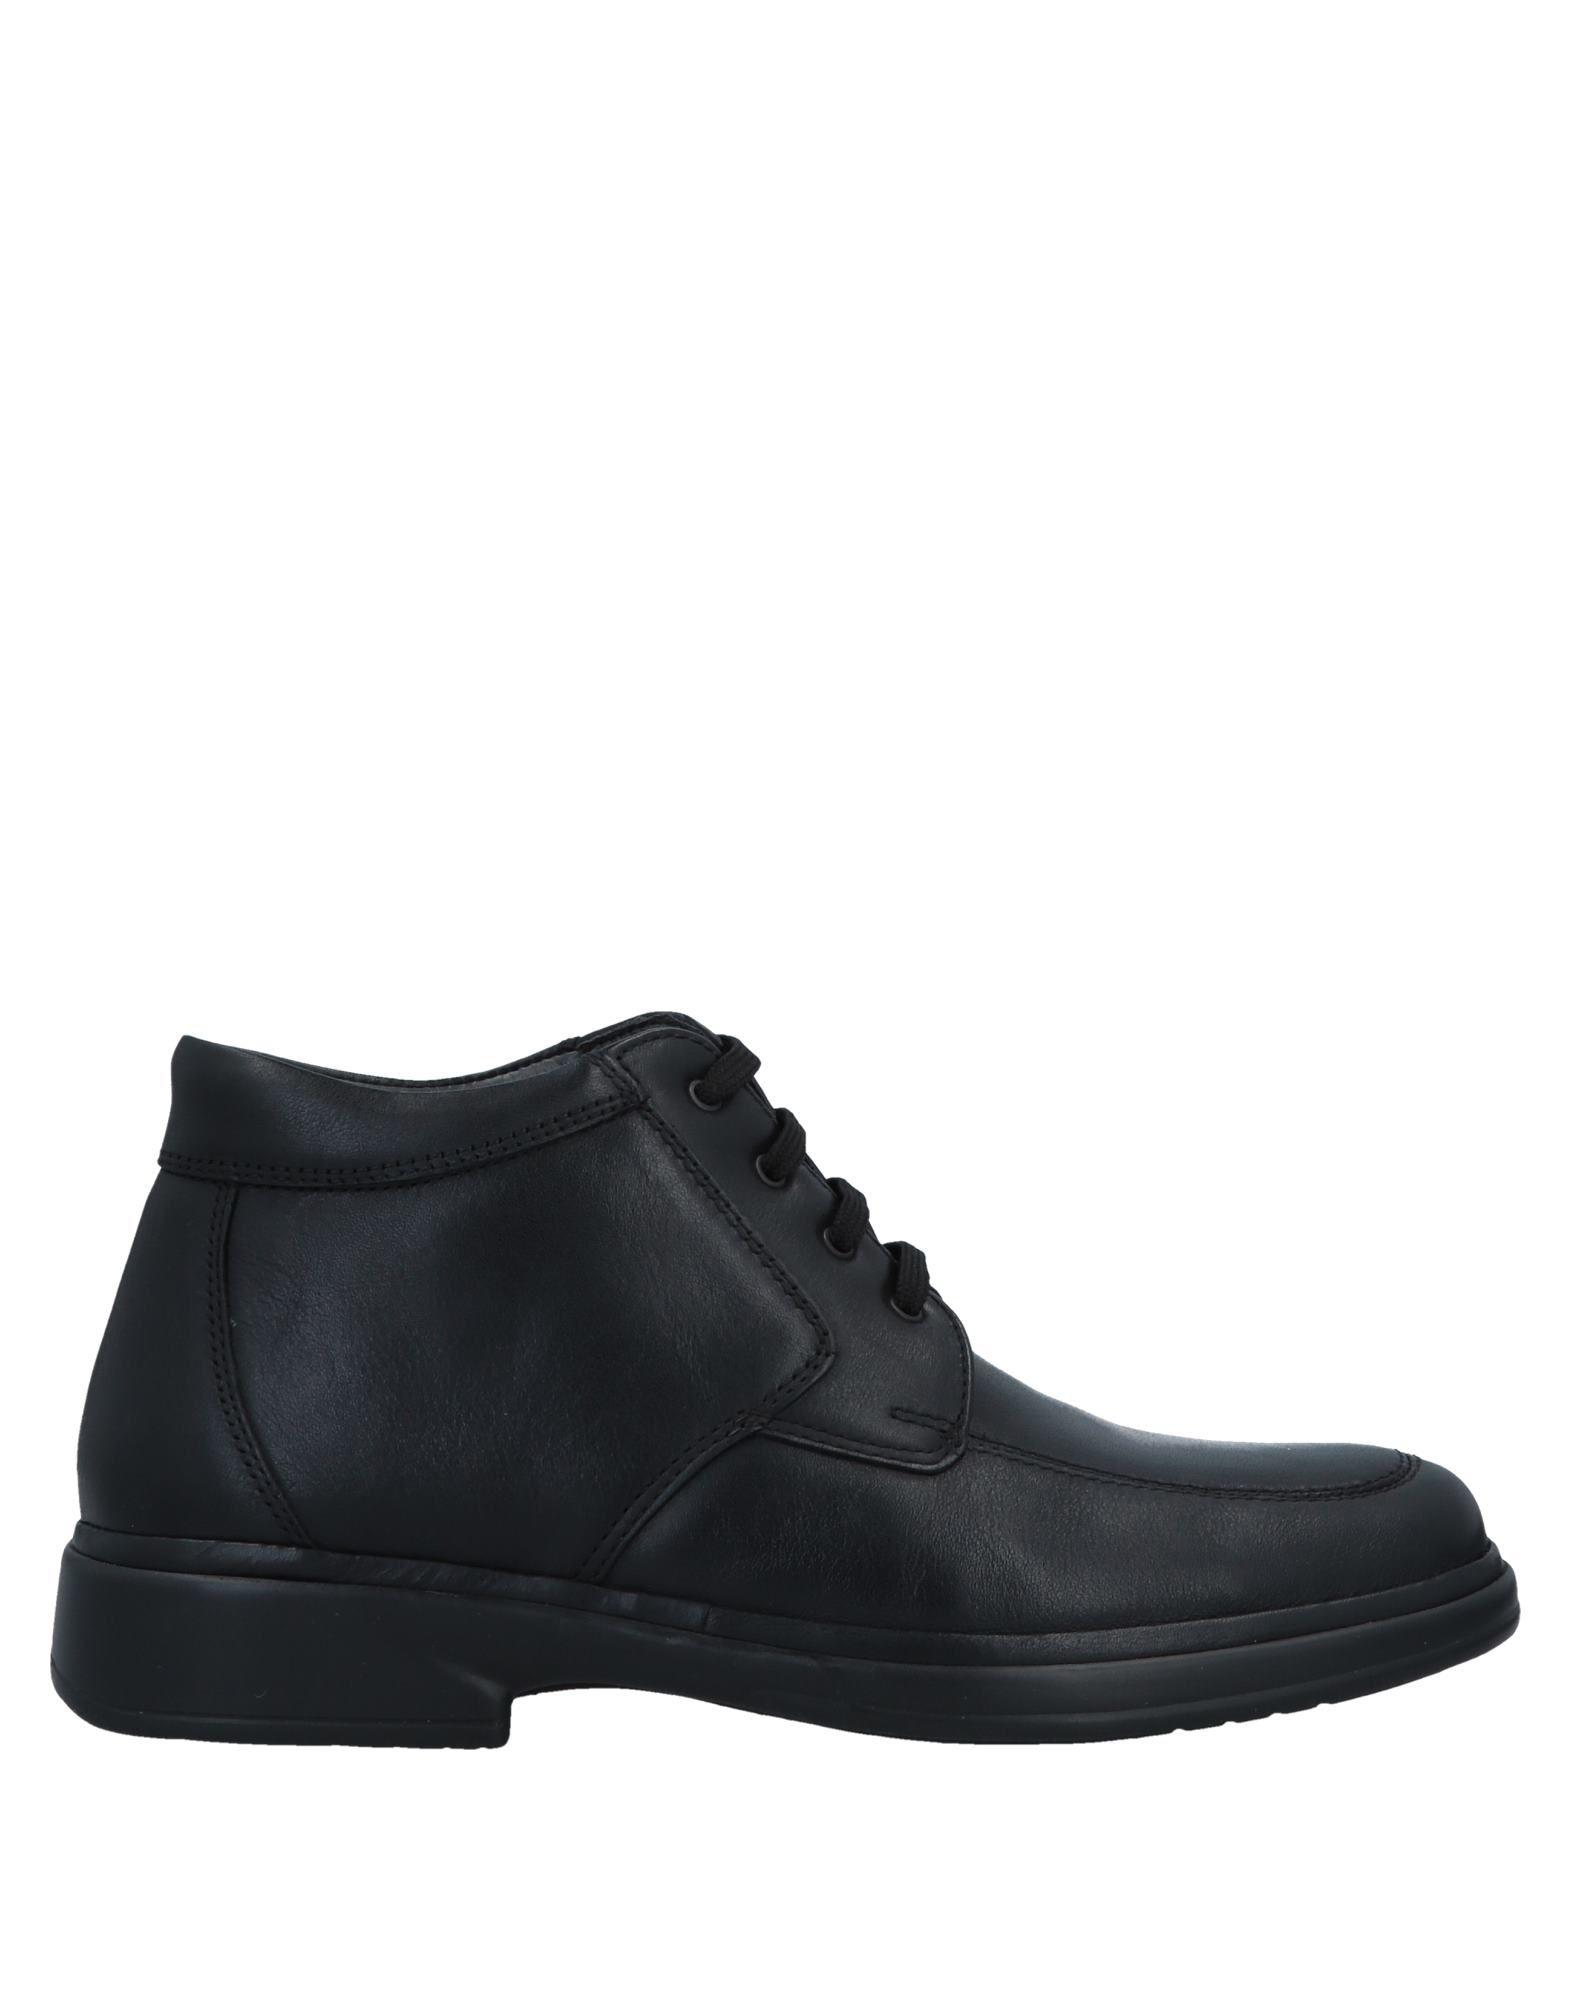 MELLUSO Полусапоги и высокие ботинки melluso полусапоги и высокие ботинки